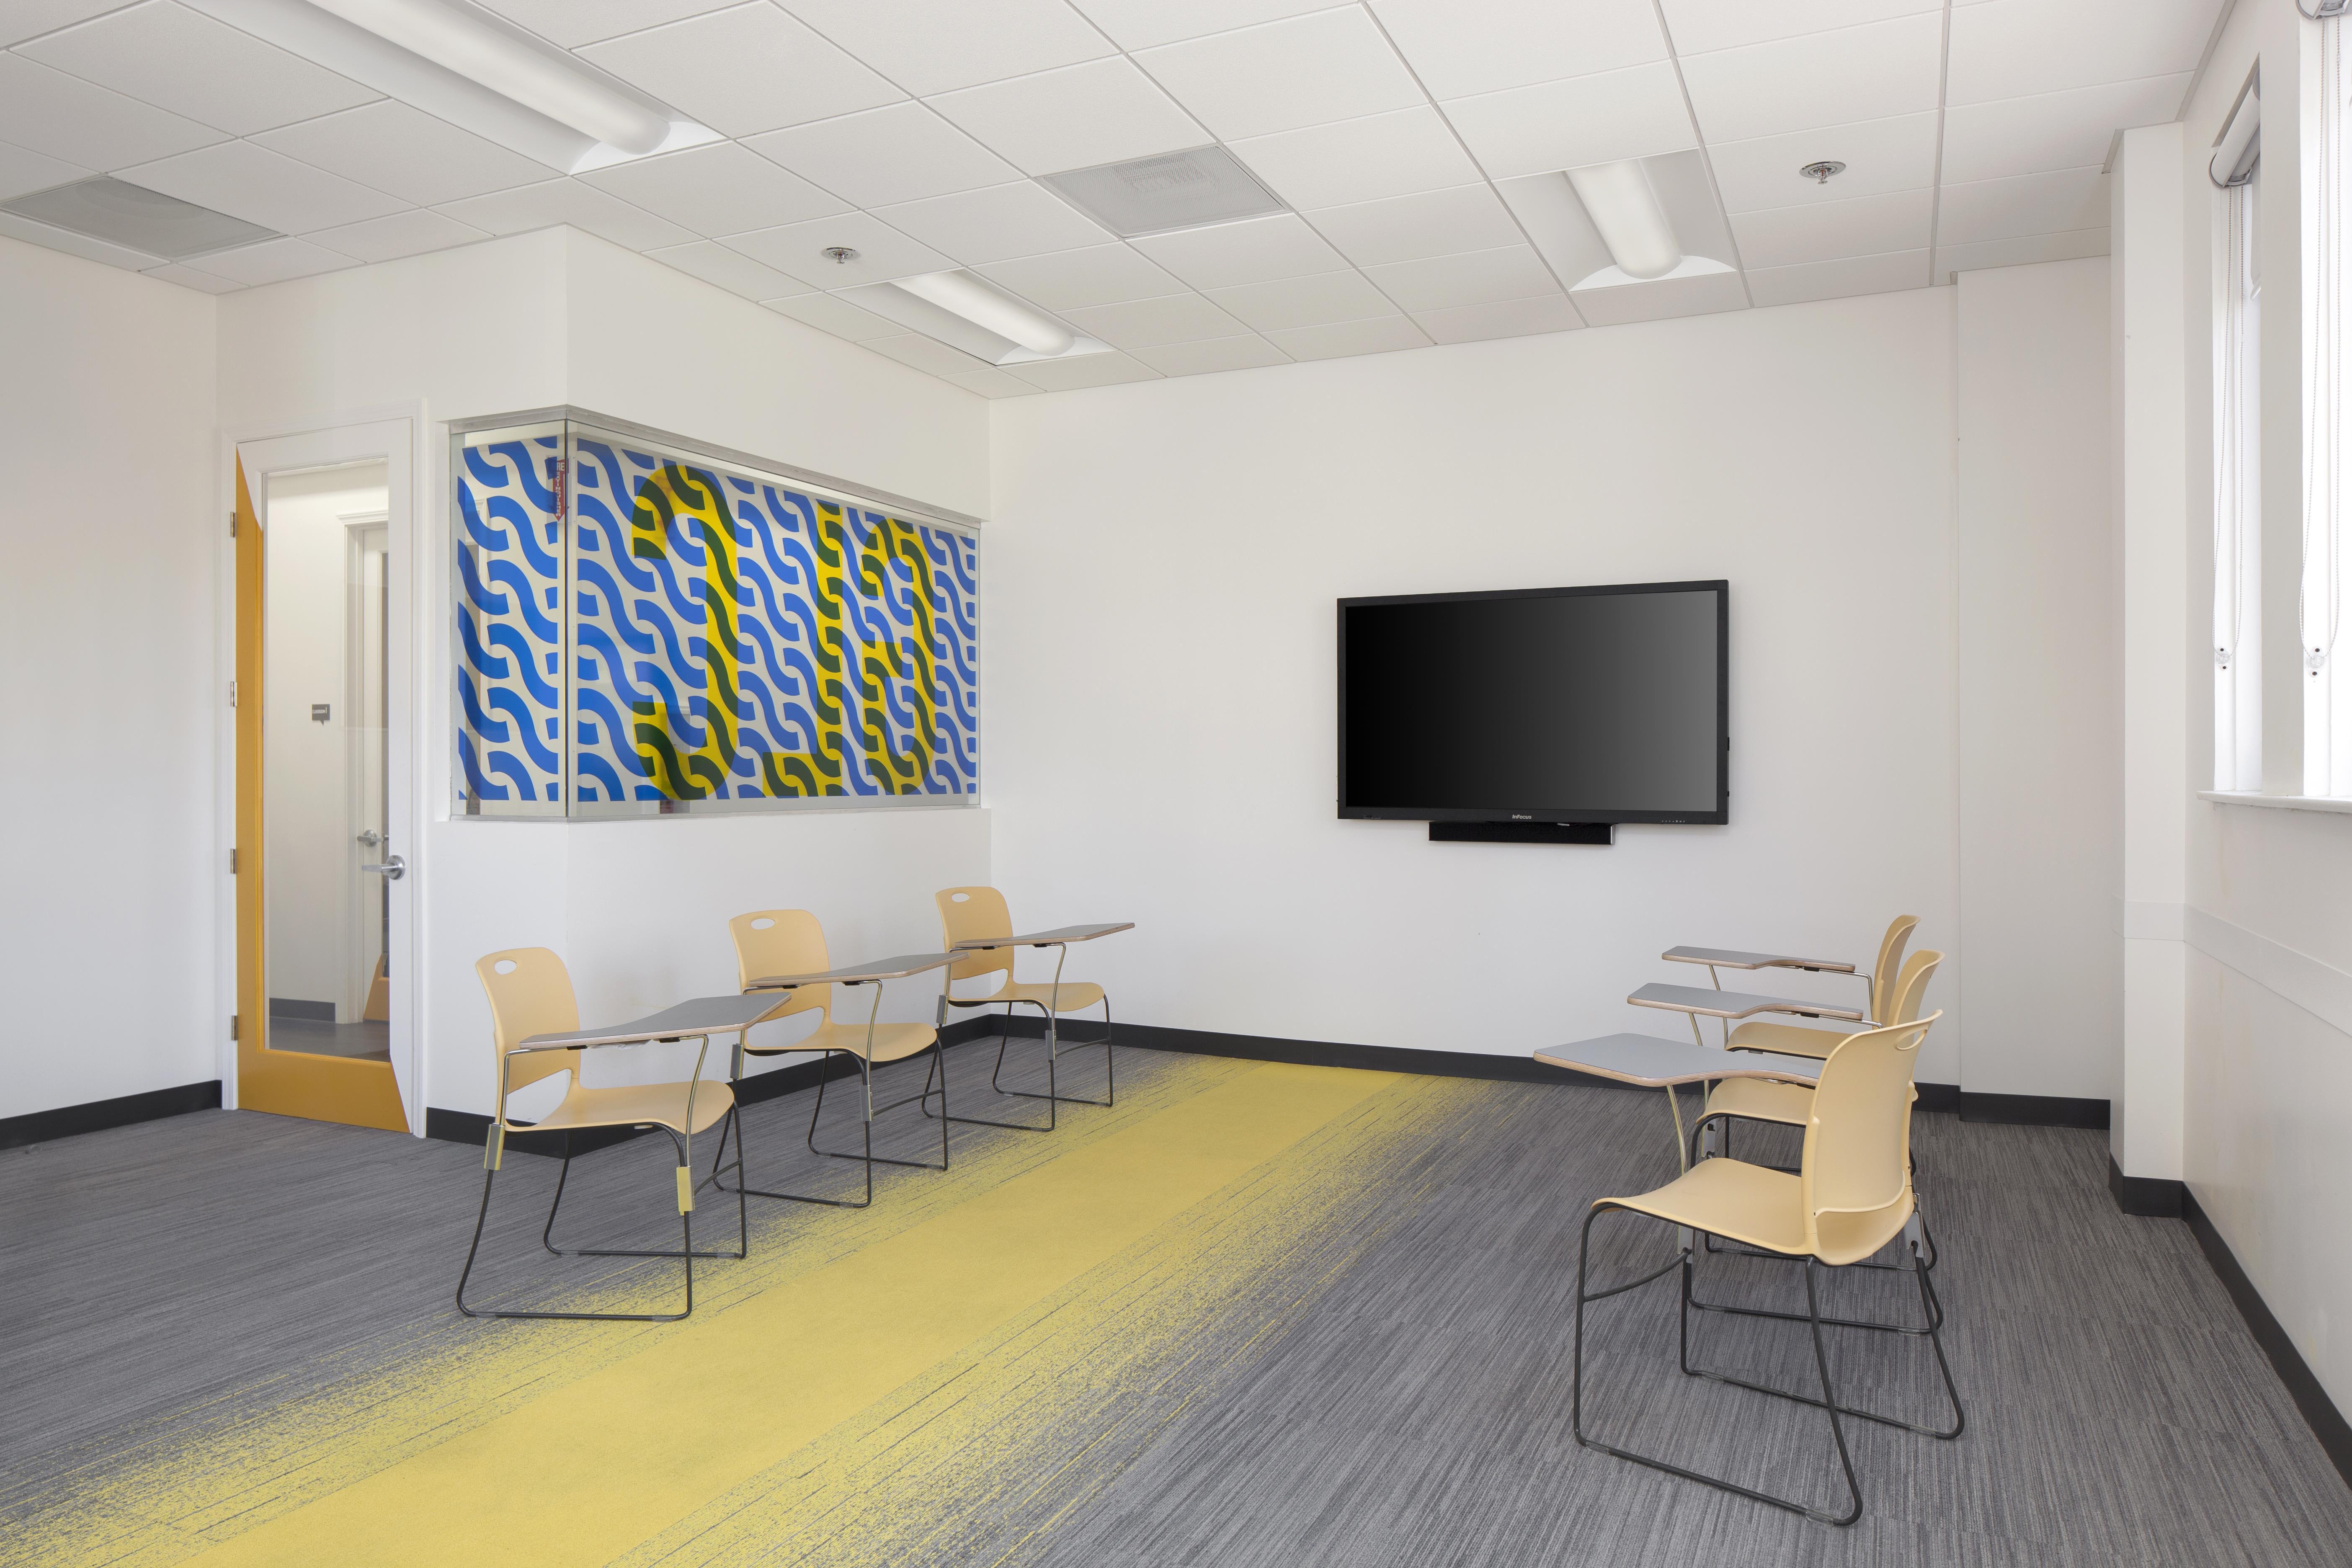 Stafford House International - Training room/classroom (2)